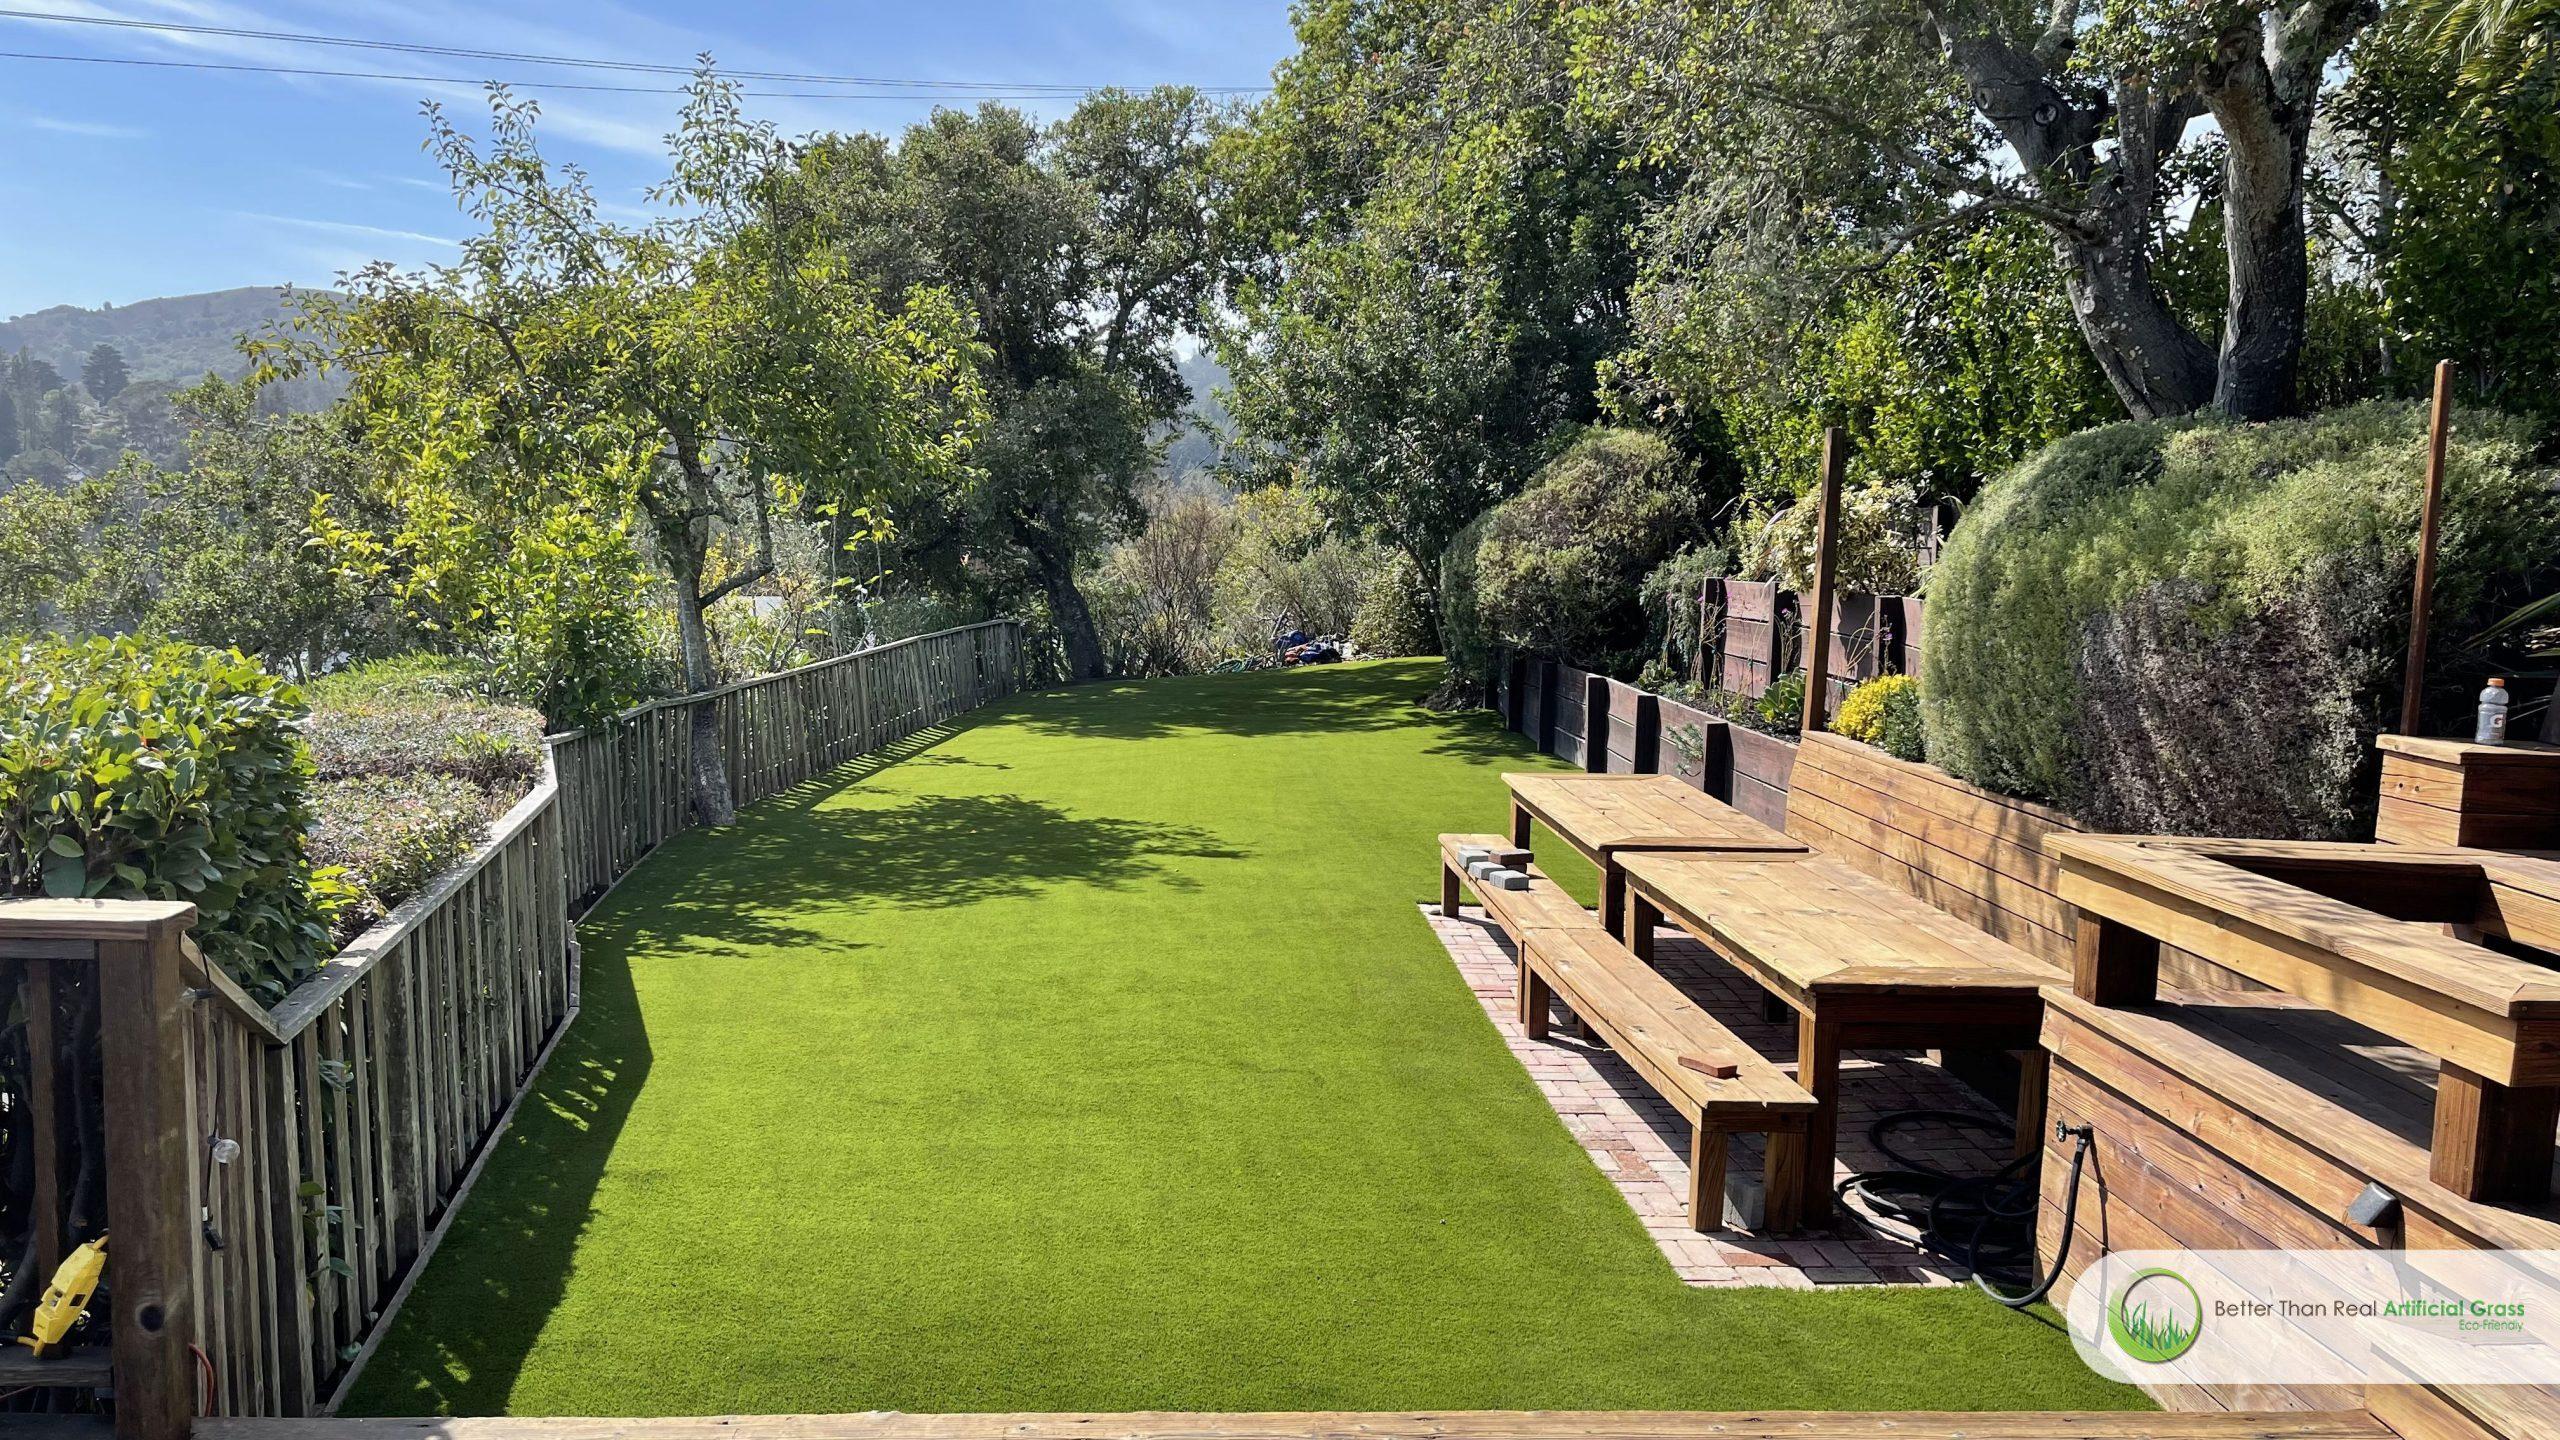 Artificial grass installation in California